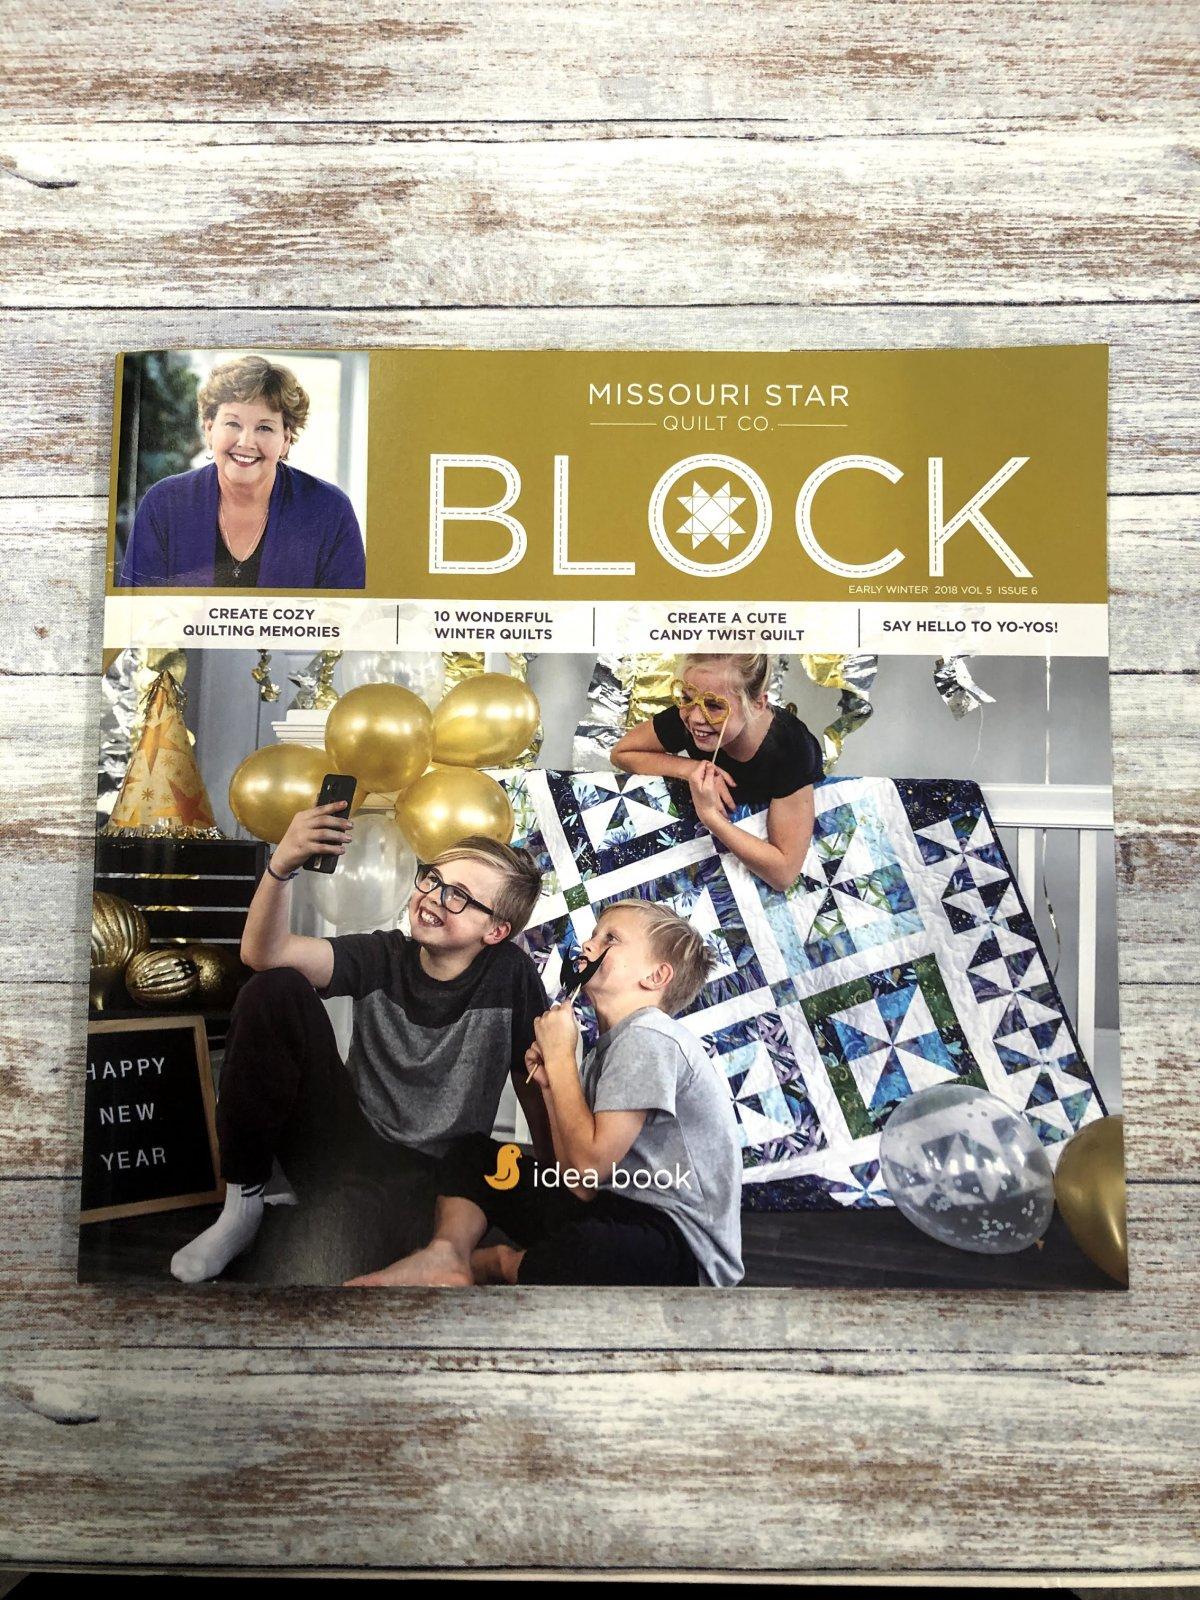 Missouri Star Block Early Winter 2018 Vol 5 Issue 6